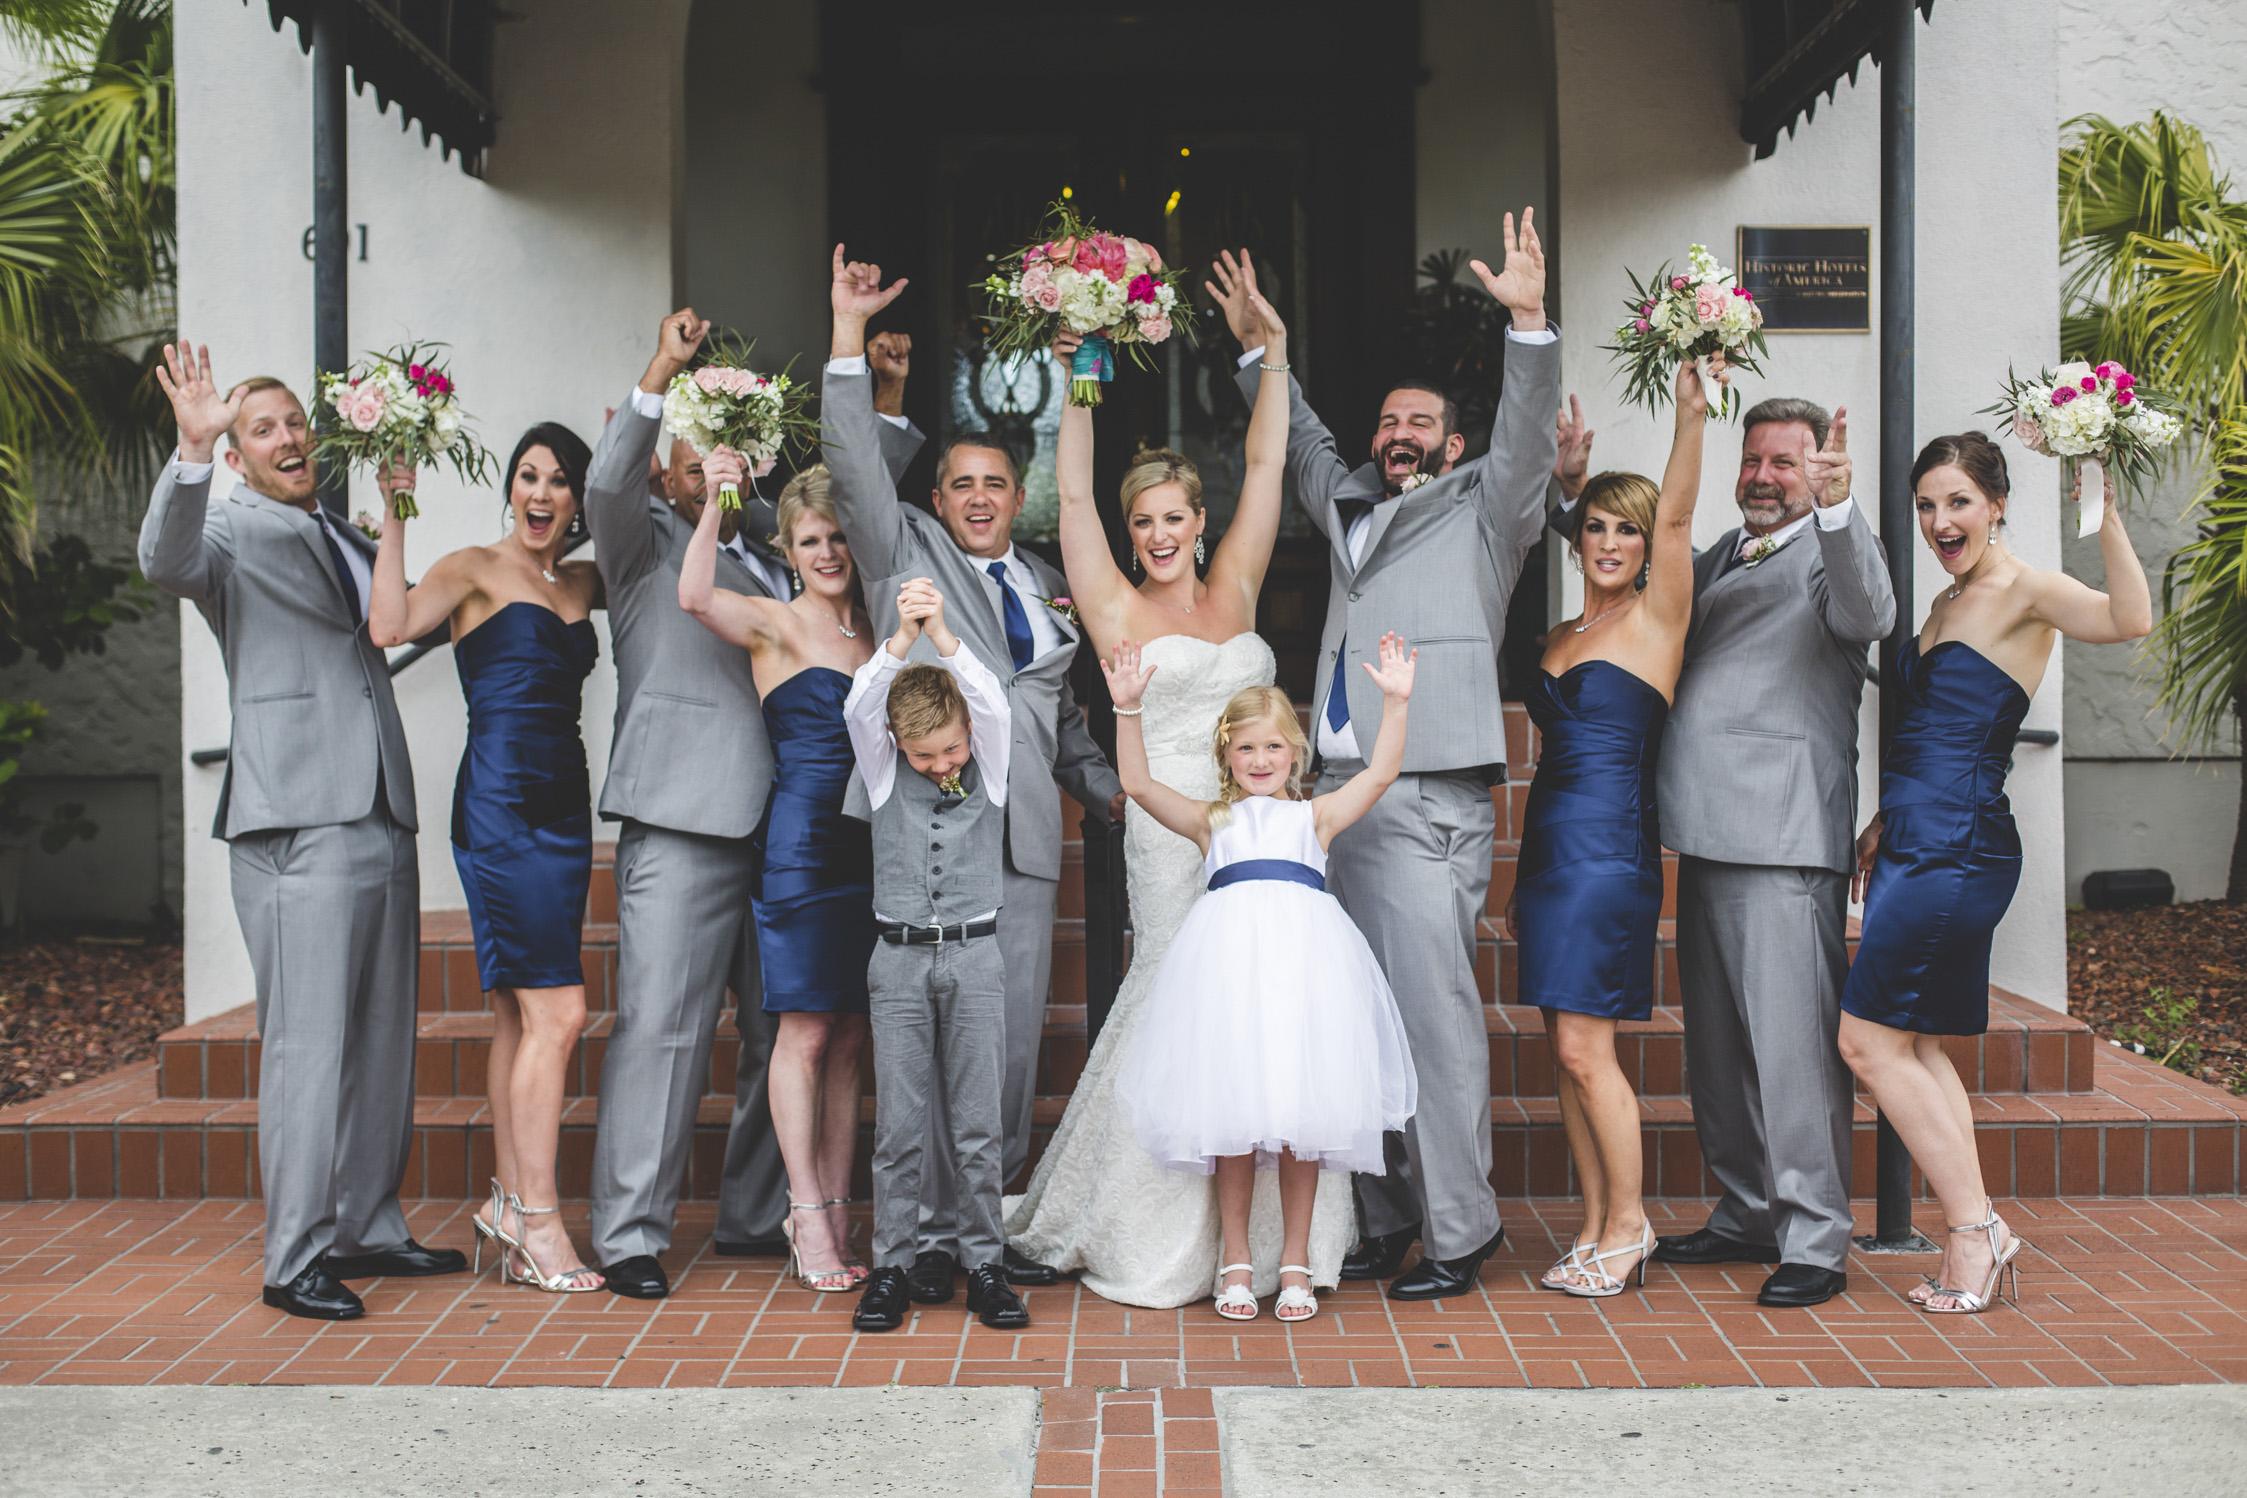 adam-szarmack-casa-marina-wedding-photographer-jacksonville-beach-florida-24.jpg